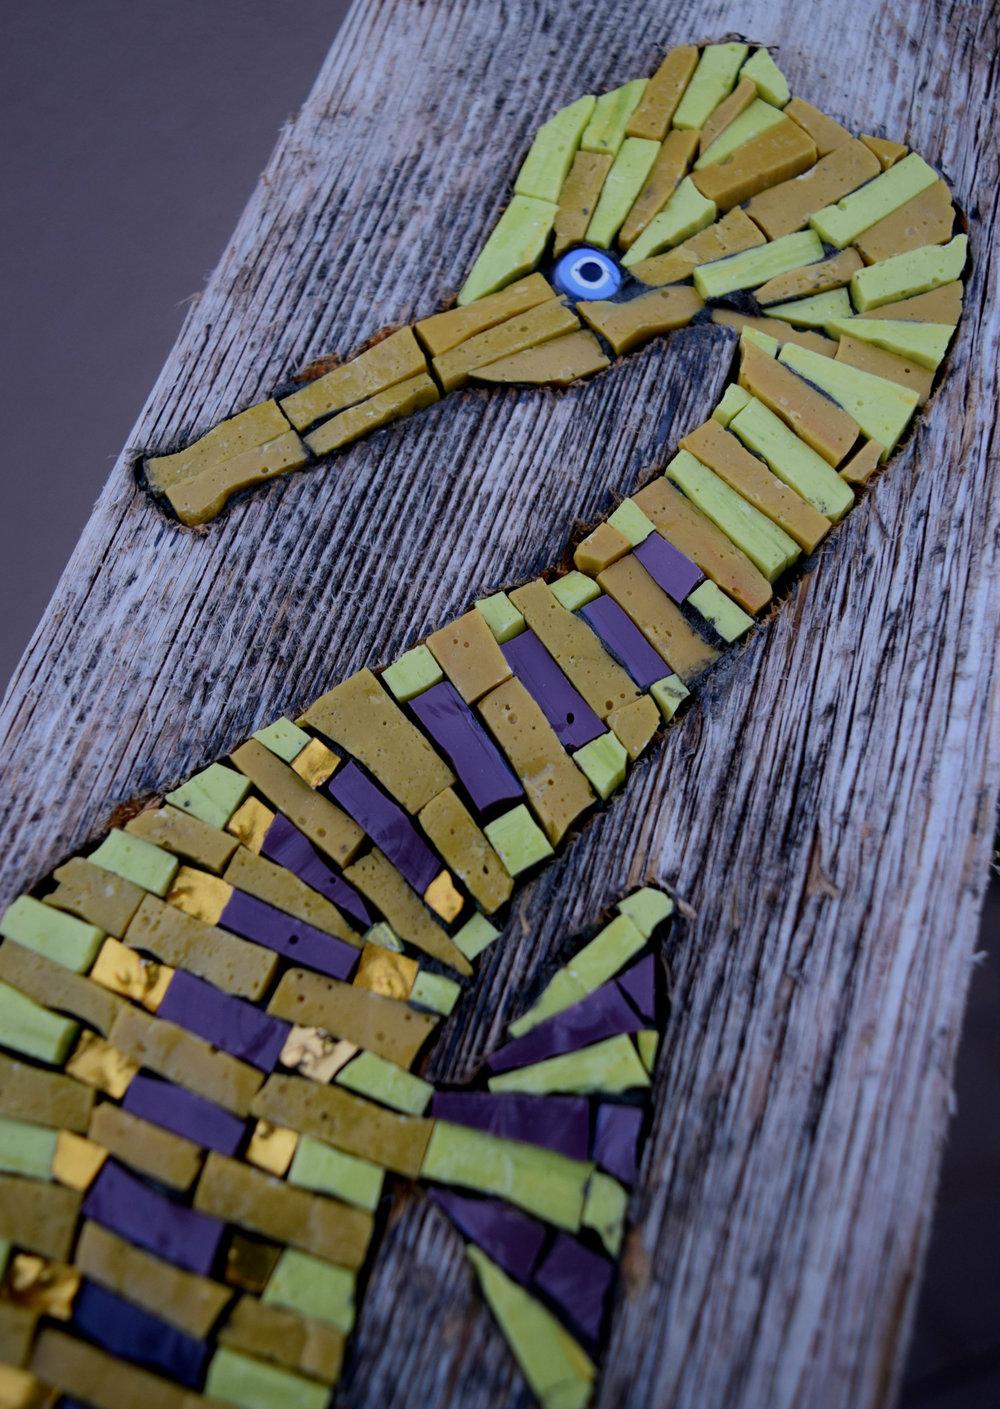 Detail of Seahorse